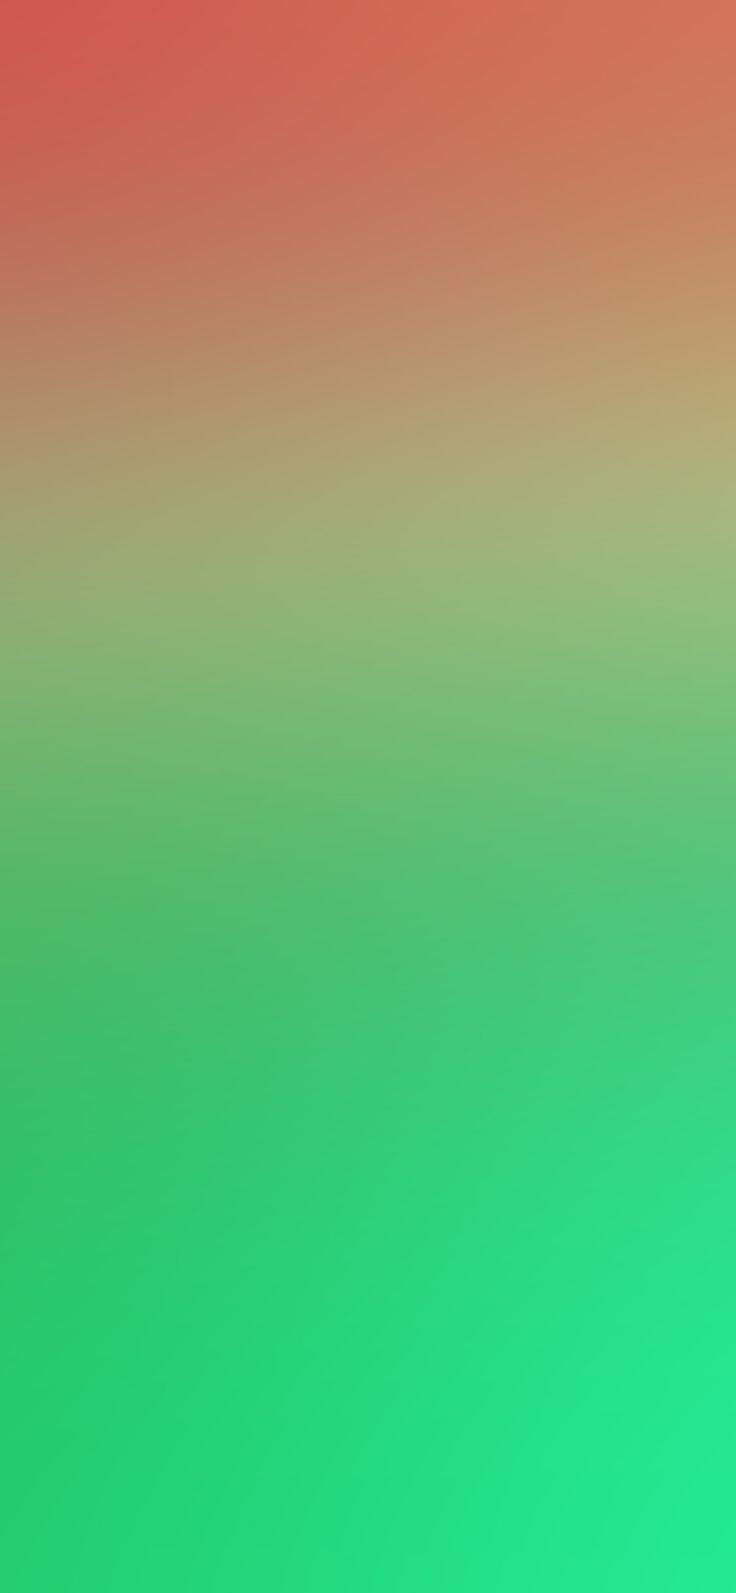 Iphone X Wallpaper Sn20 Green Red Water Melon Blur Gradation Via